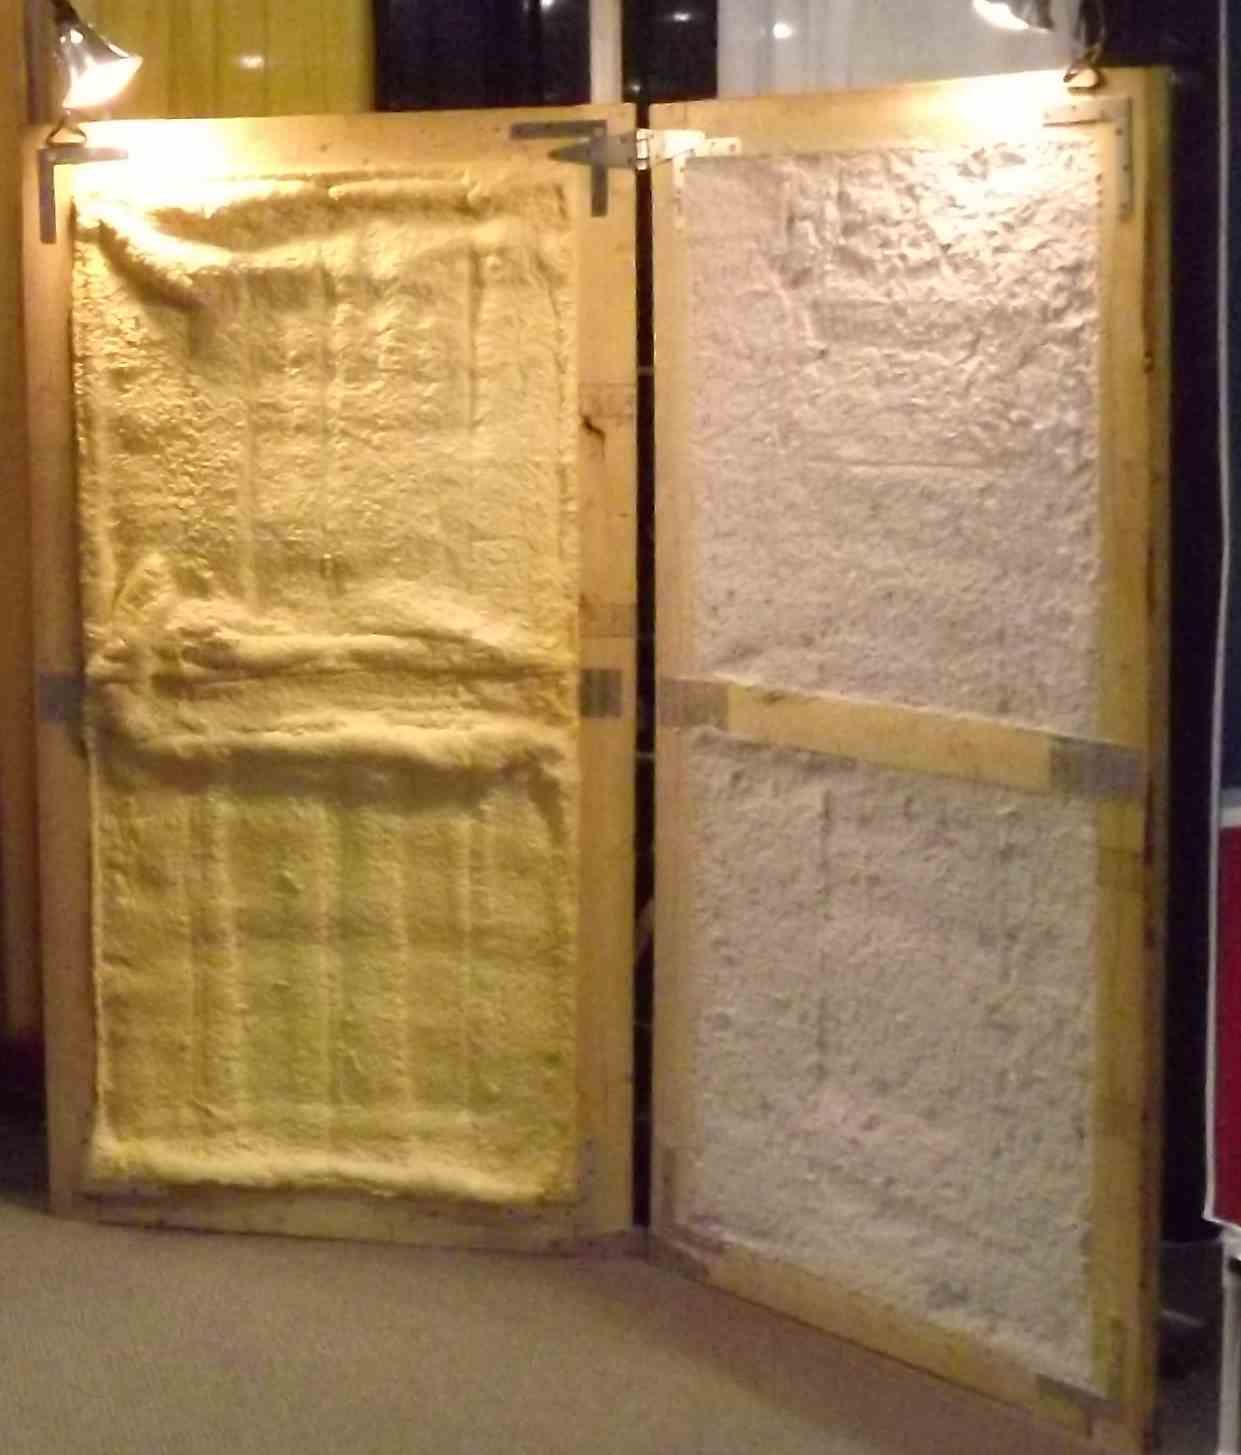 Spray Foam Insulation Vs Satac Insulation For Pole Barns